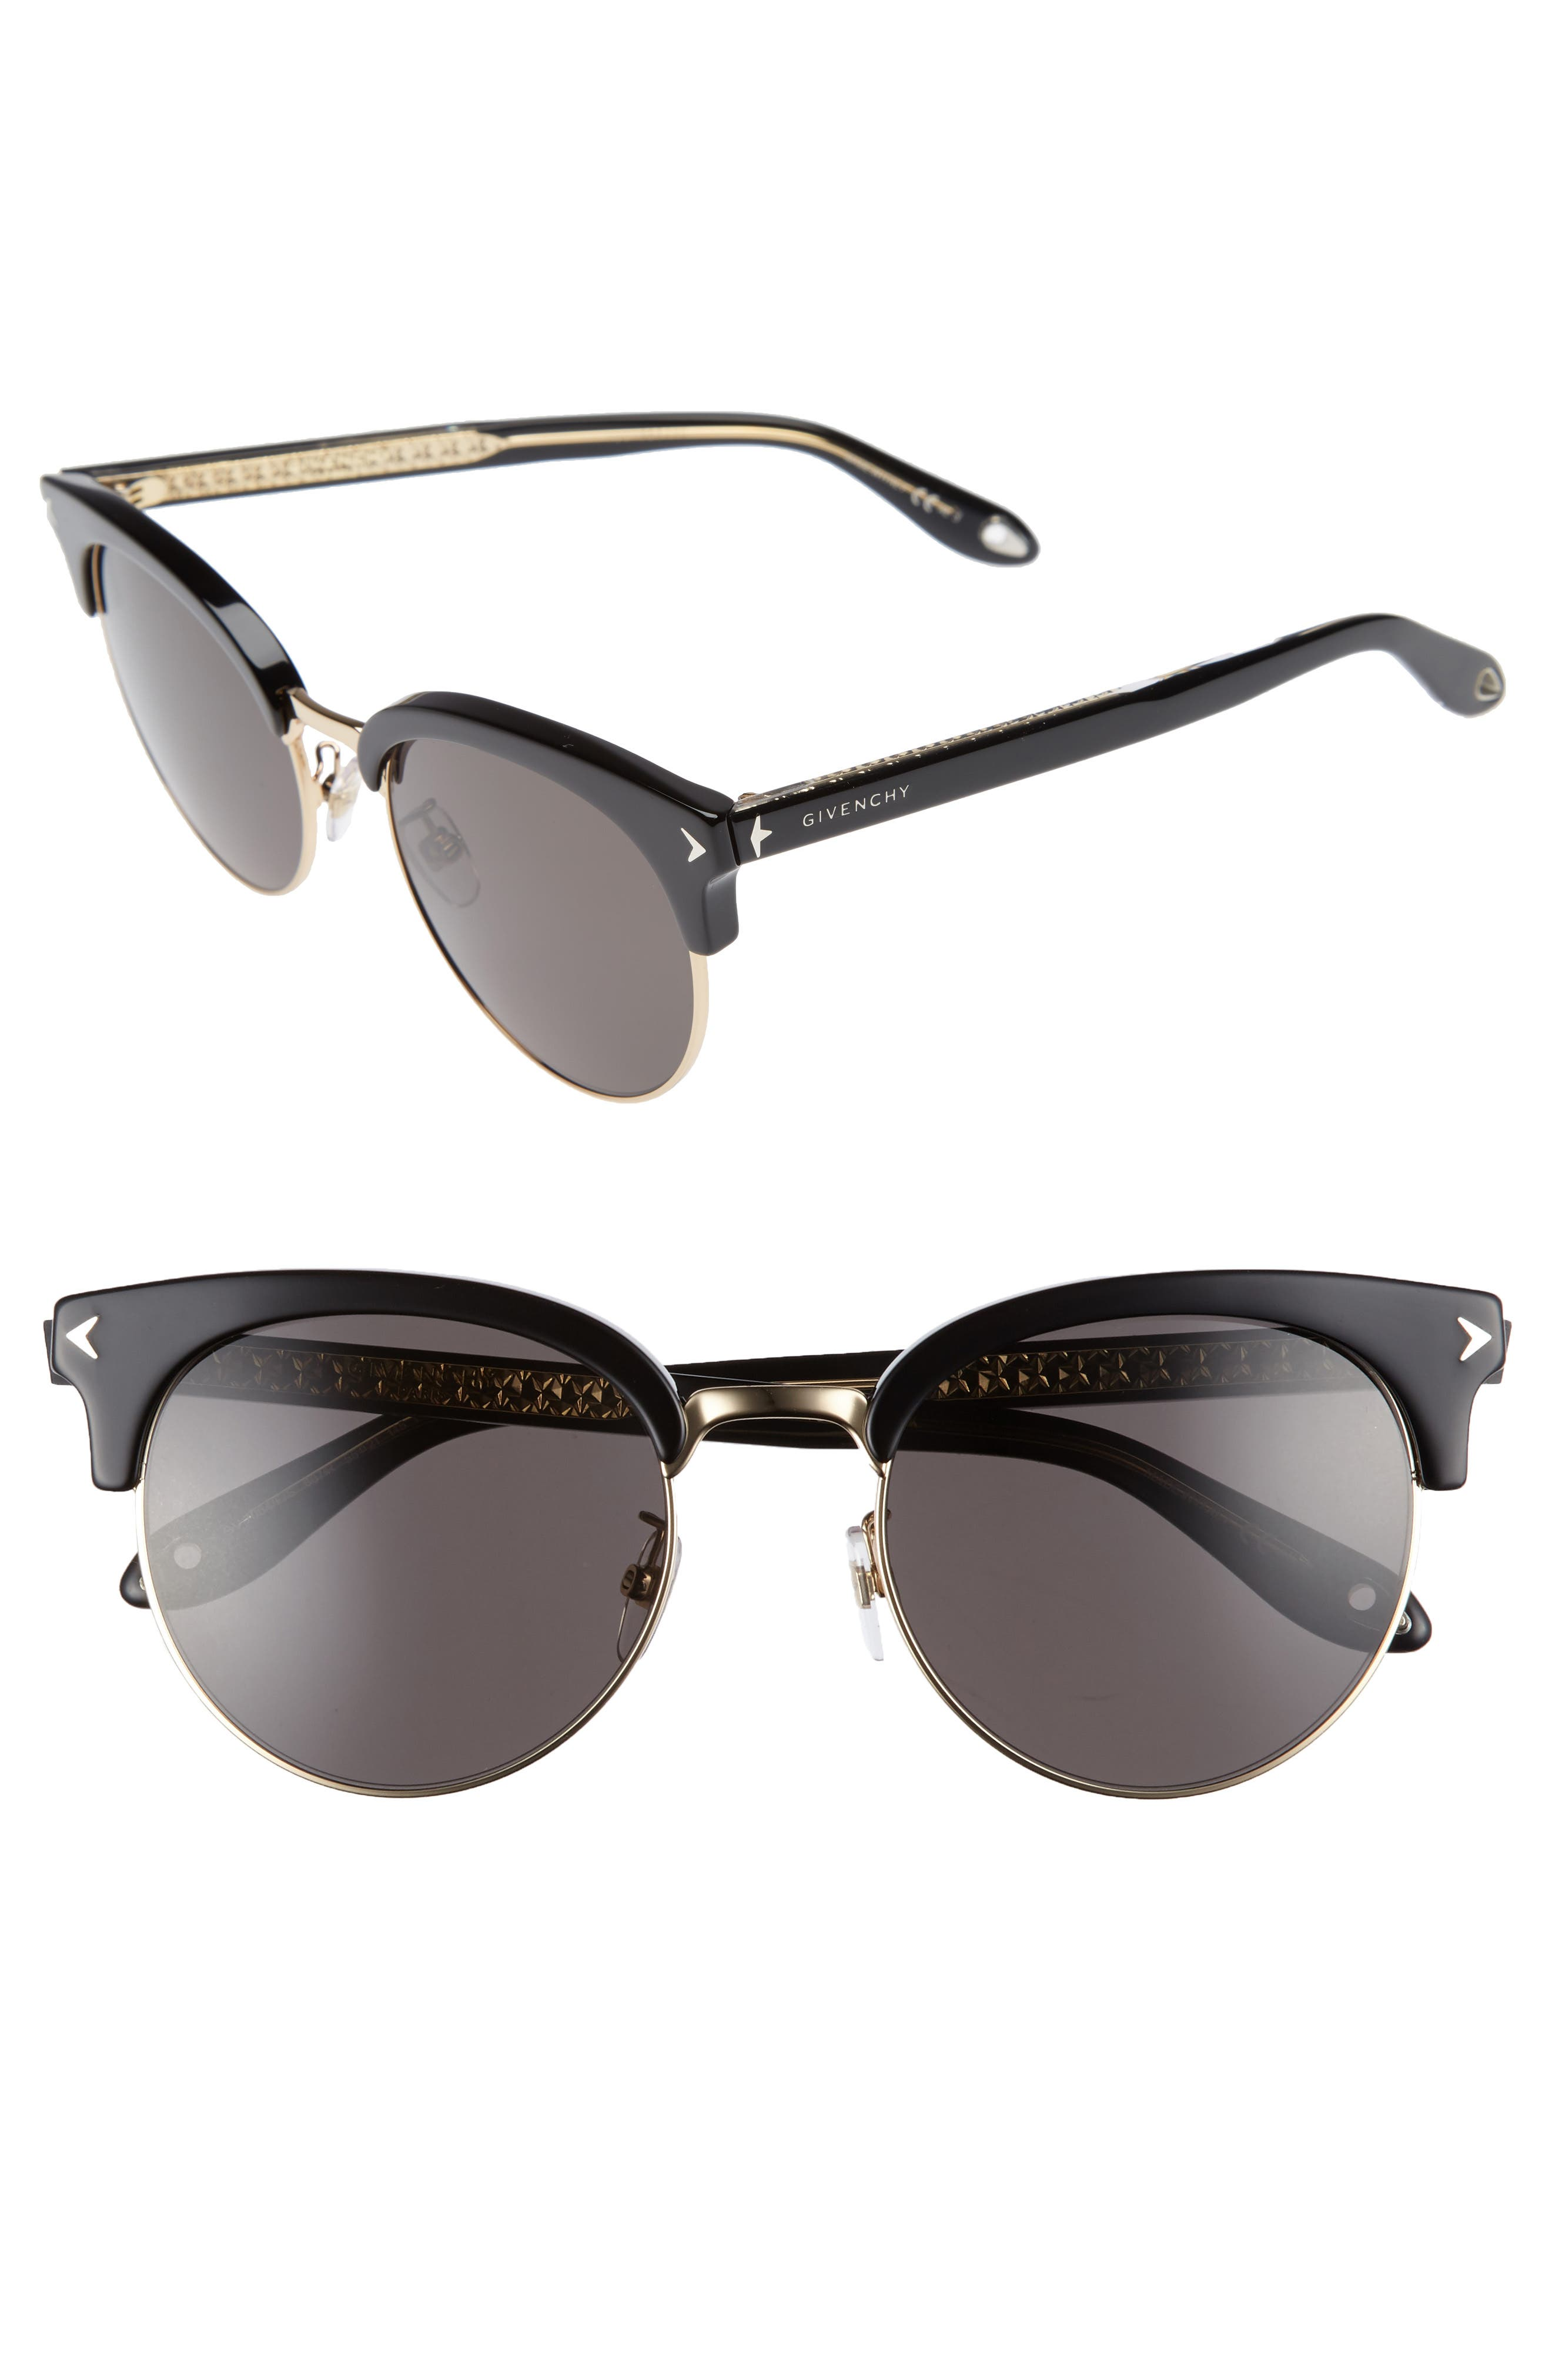 55mm Sunglasses,                         Main,                         color, Black